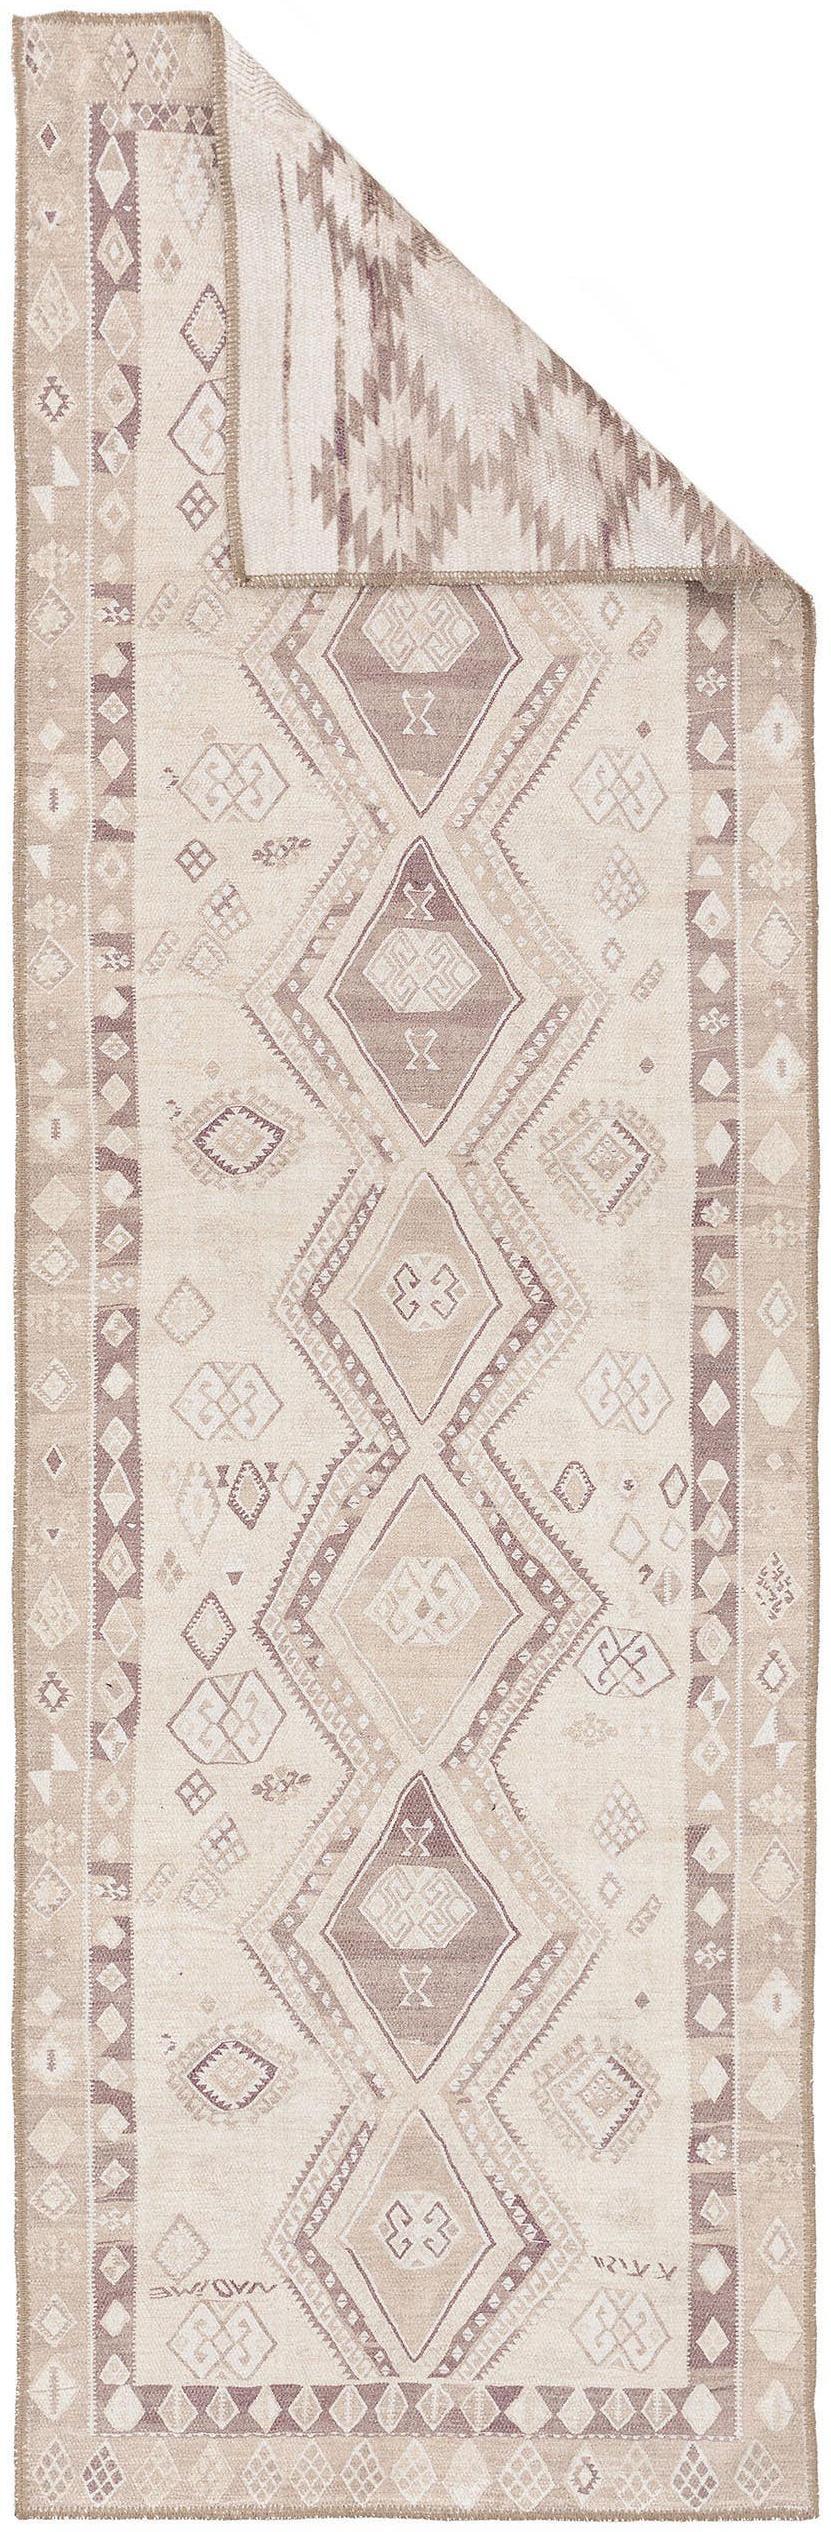 Passatoia kilim Ana Aztec, 80% poliestere 20% cotone, Beige, taupe, Larg. 75 x Lung. 230 cm